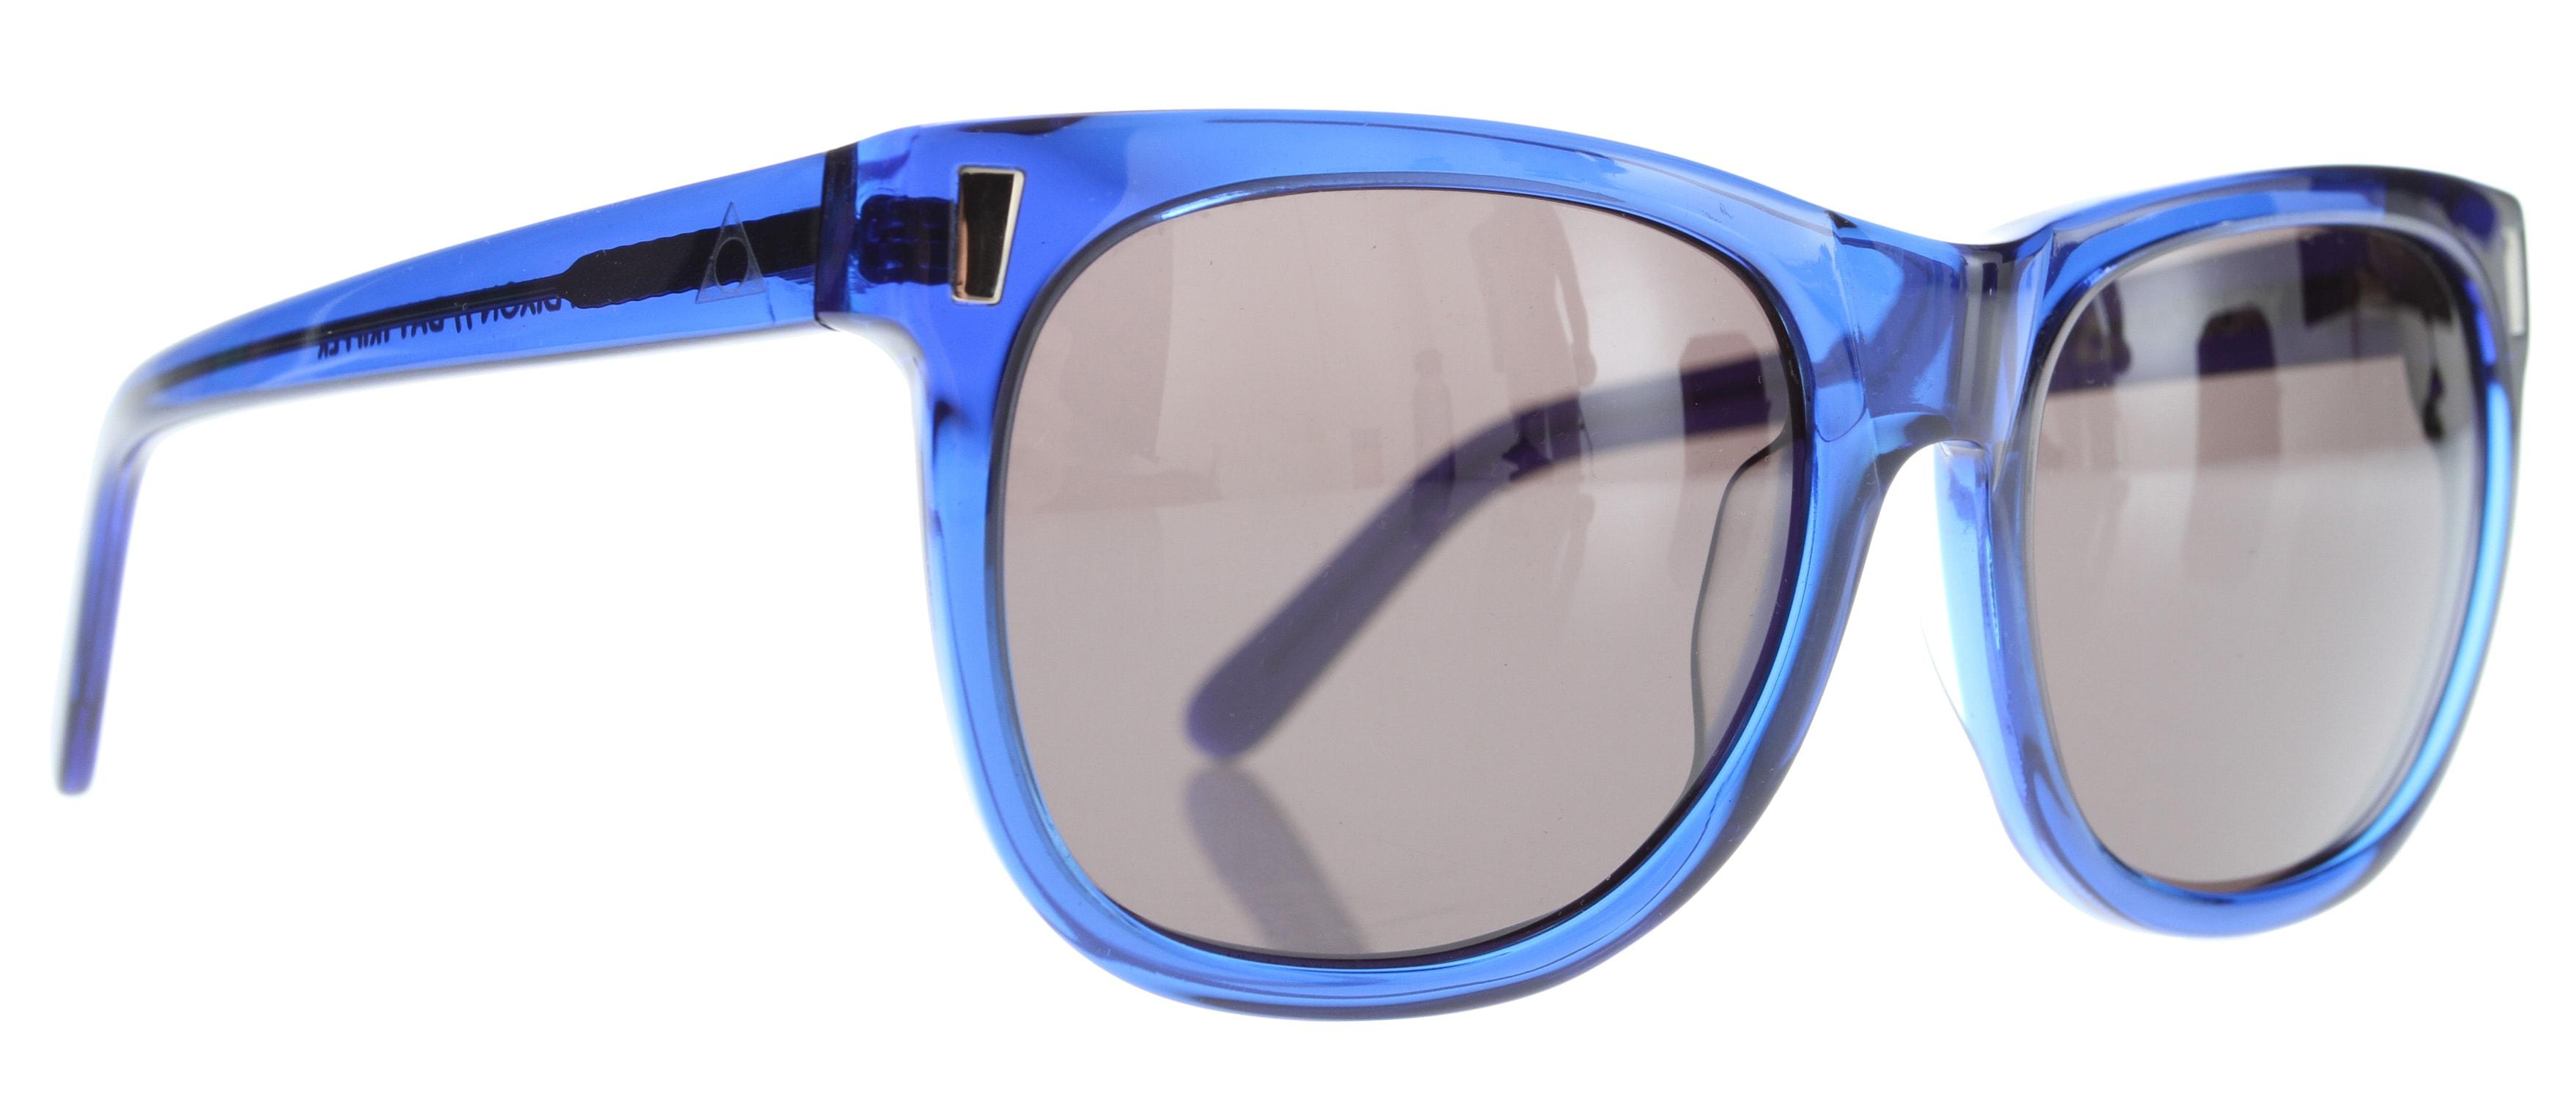 63228154c1 Ashbury Day Tripper Antwuan Dixon Sunglasses - thumbnail 1